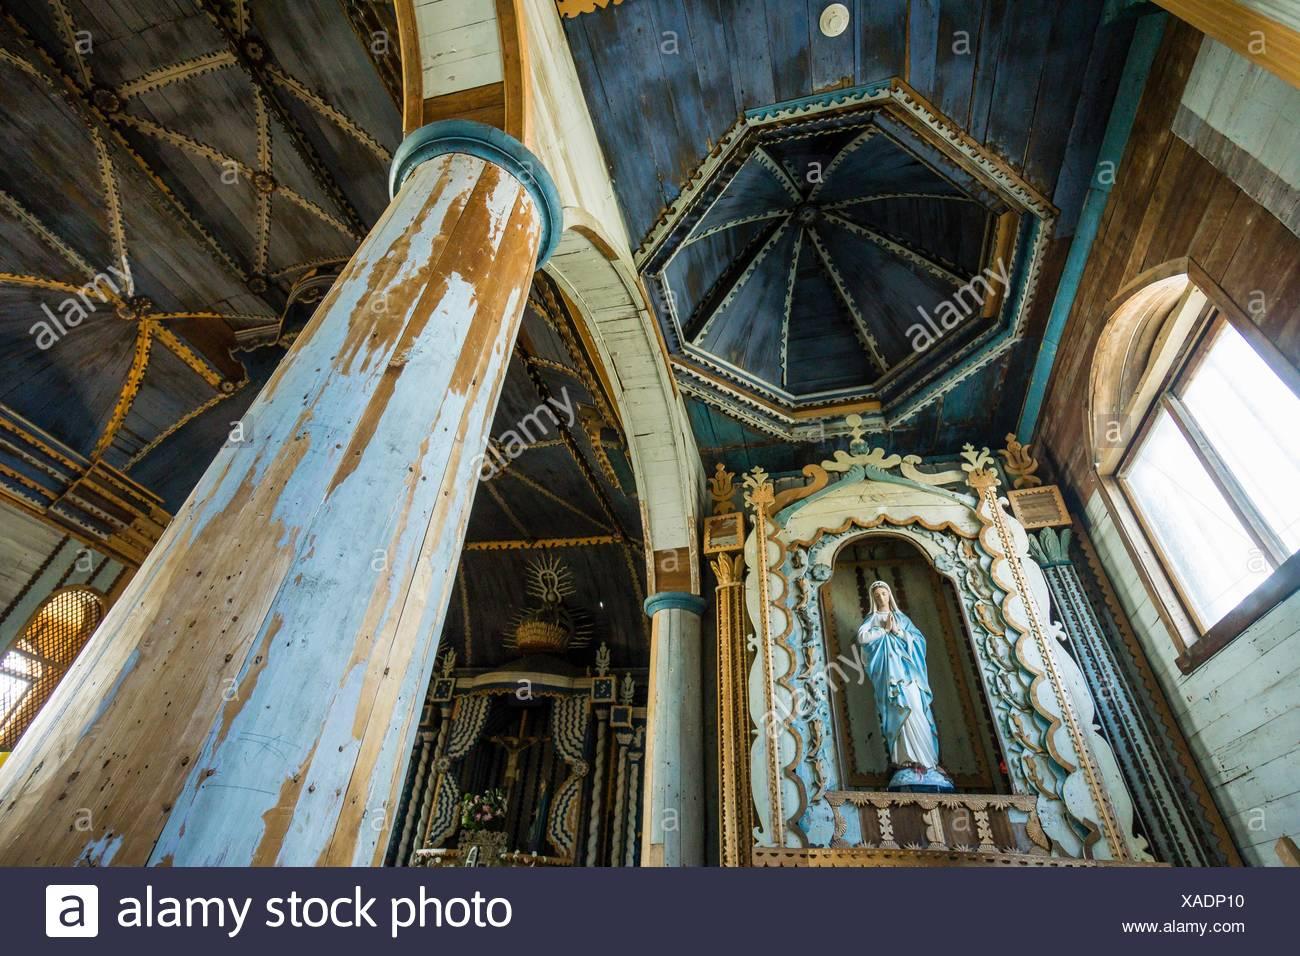 Iglesia Santa María de Loreto ,Achao, 1740, Monumento Nacional de Chile, Patrimonio de la Humanidad por la Unesco, archipiélago de Chiloé ,provincia Stock Photo